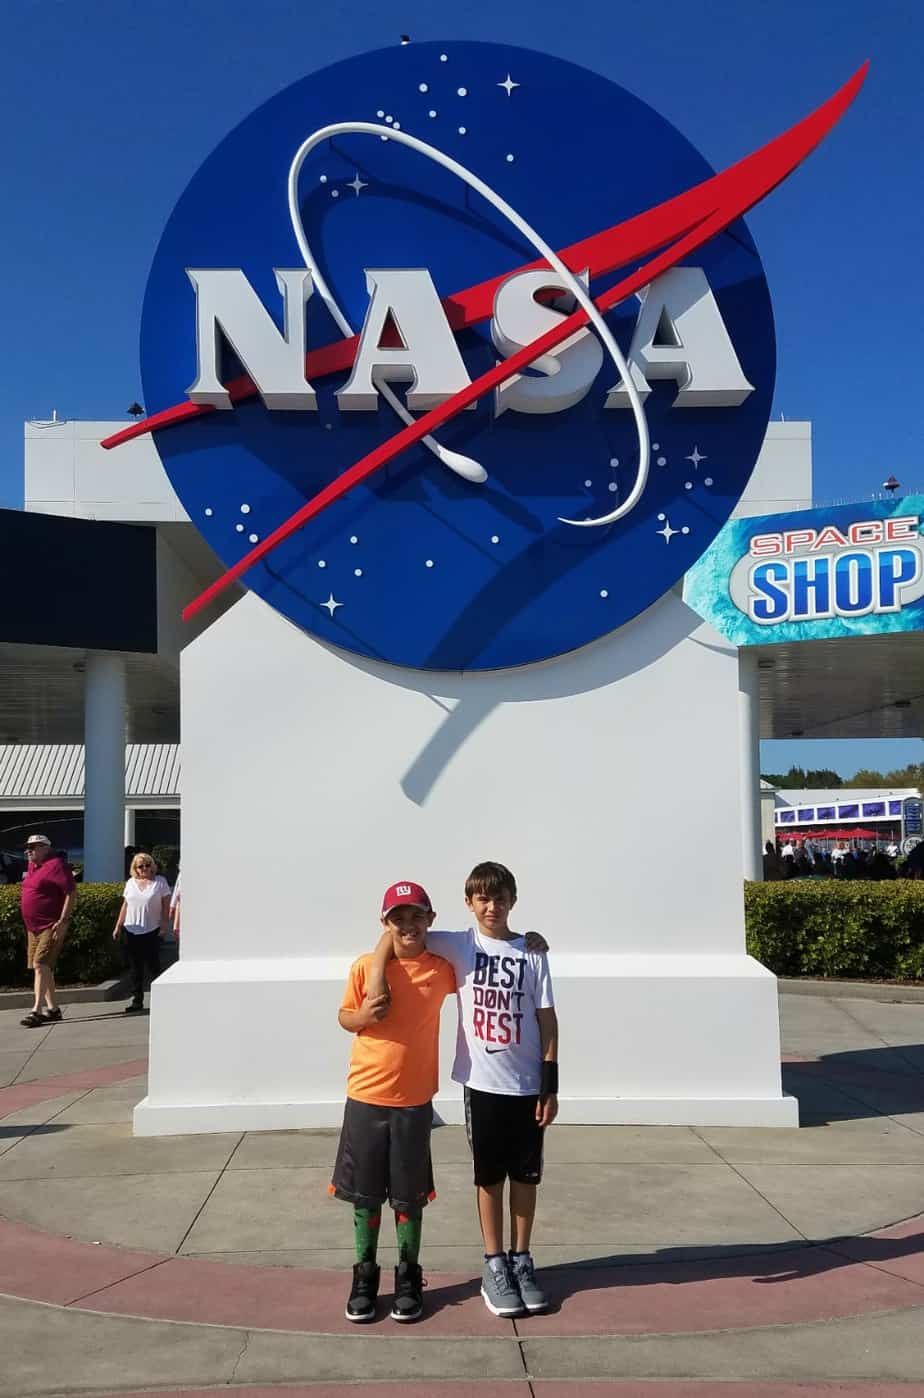 Kennedy Space Center NASA Meatball sign